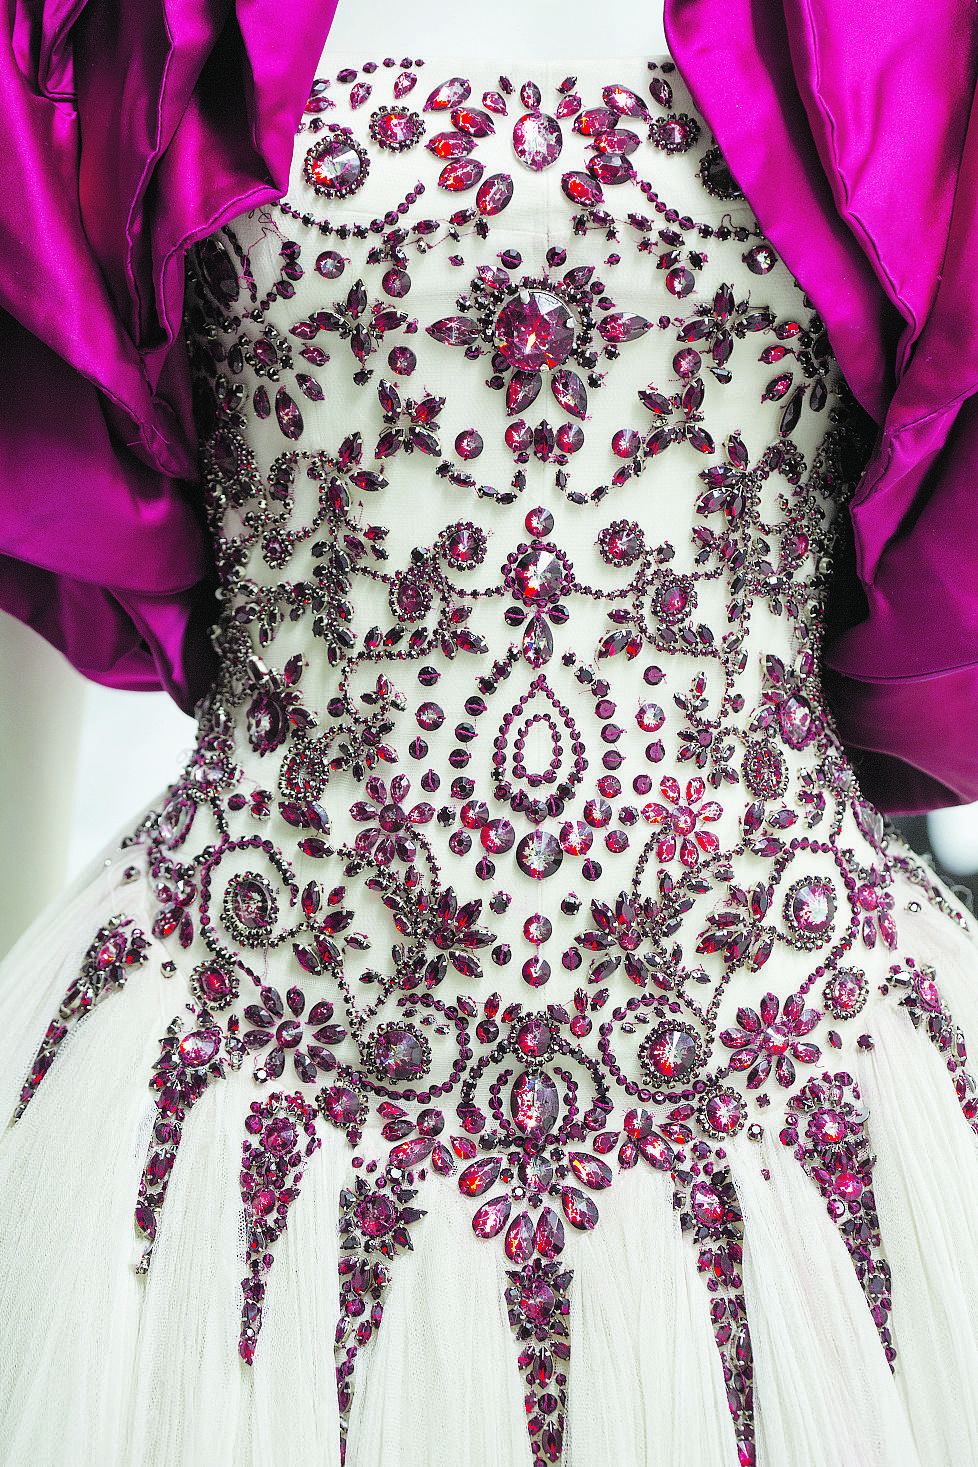 Robe (détail) rebrodée de cristaux Swarovski, collection Sarabande, été  2007, Alexander McQueen. 5421a0f79df